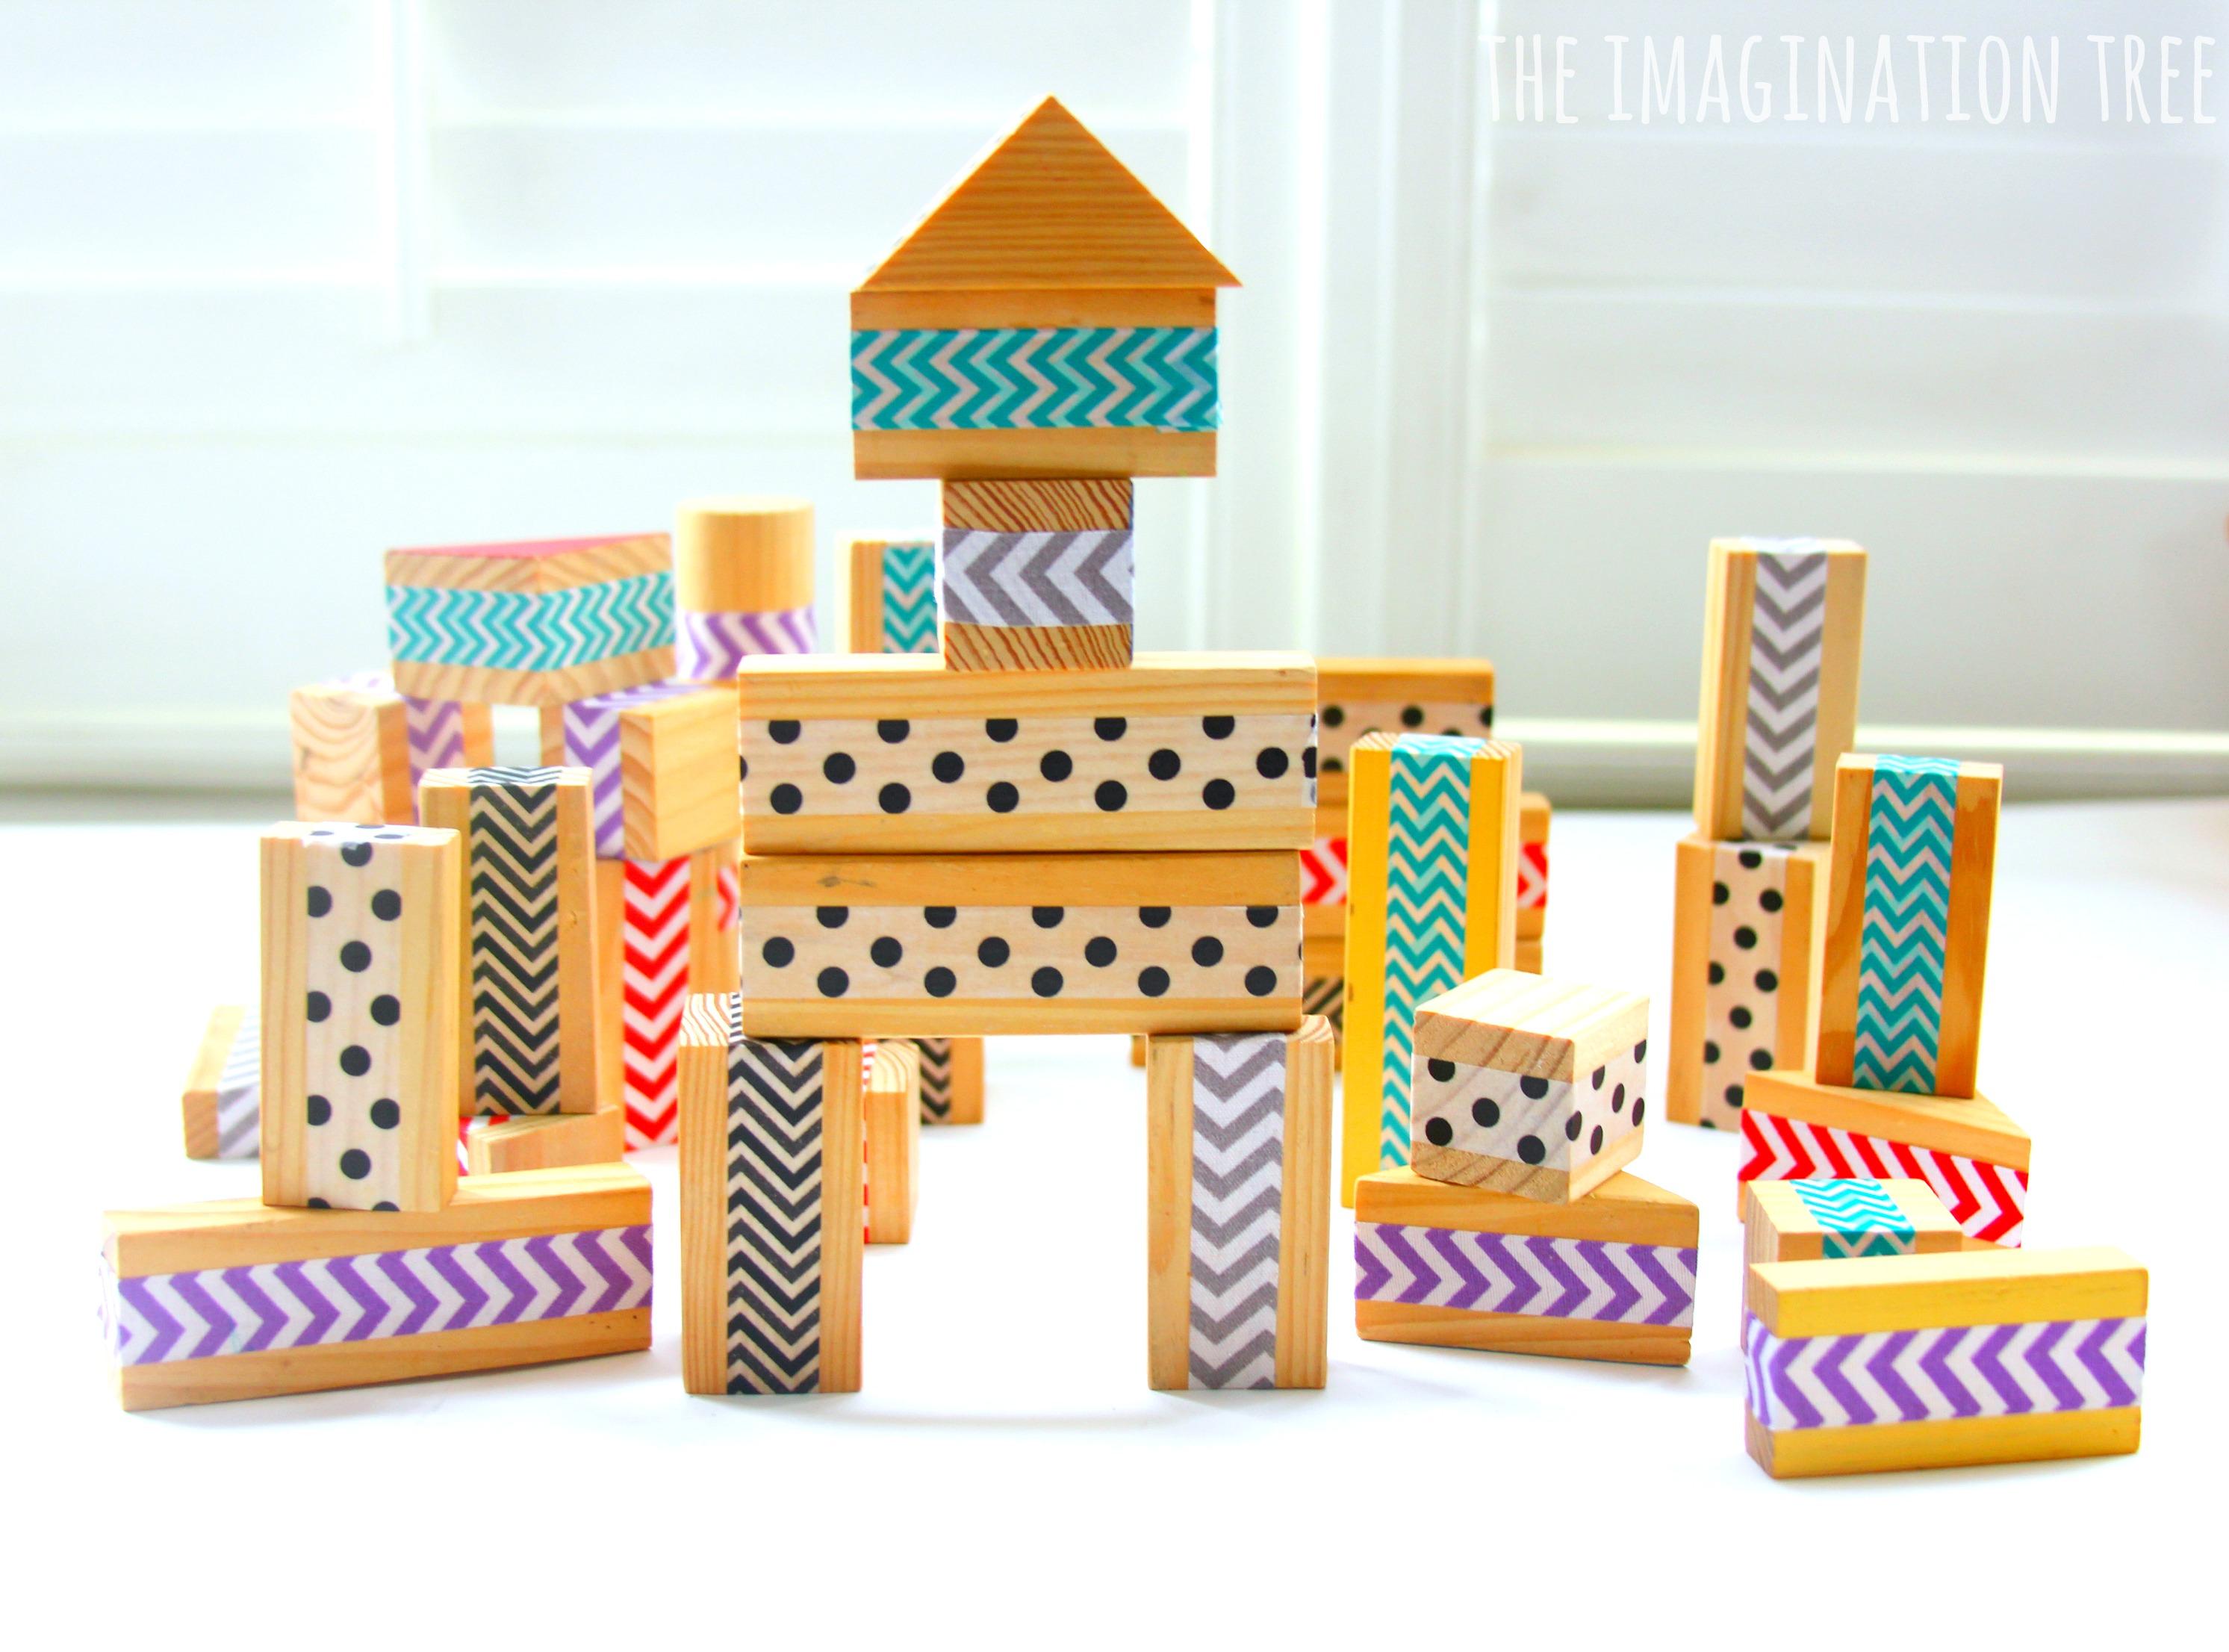 DIY Patterned Wood BlocksThe Imagination Tree